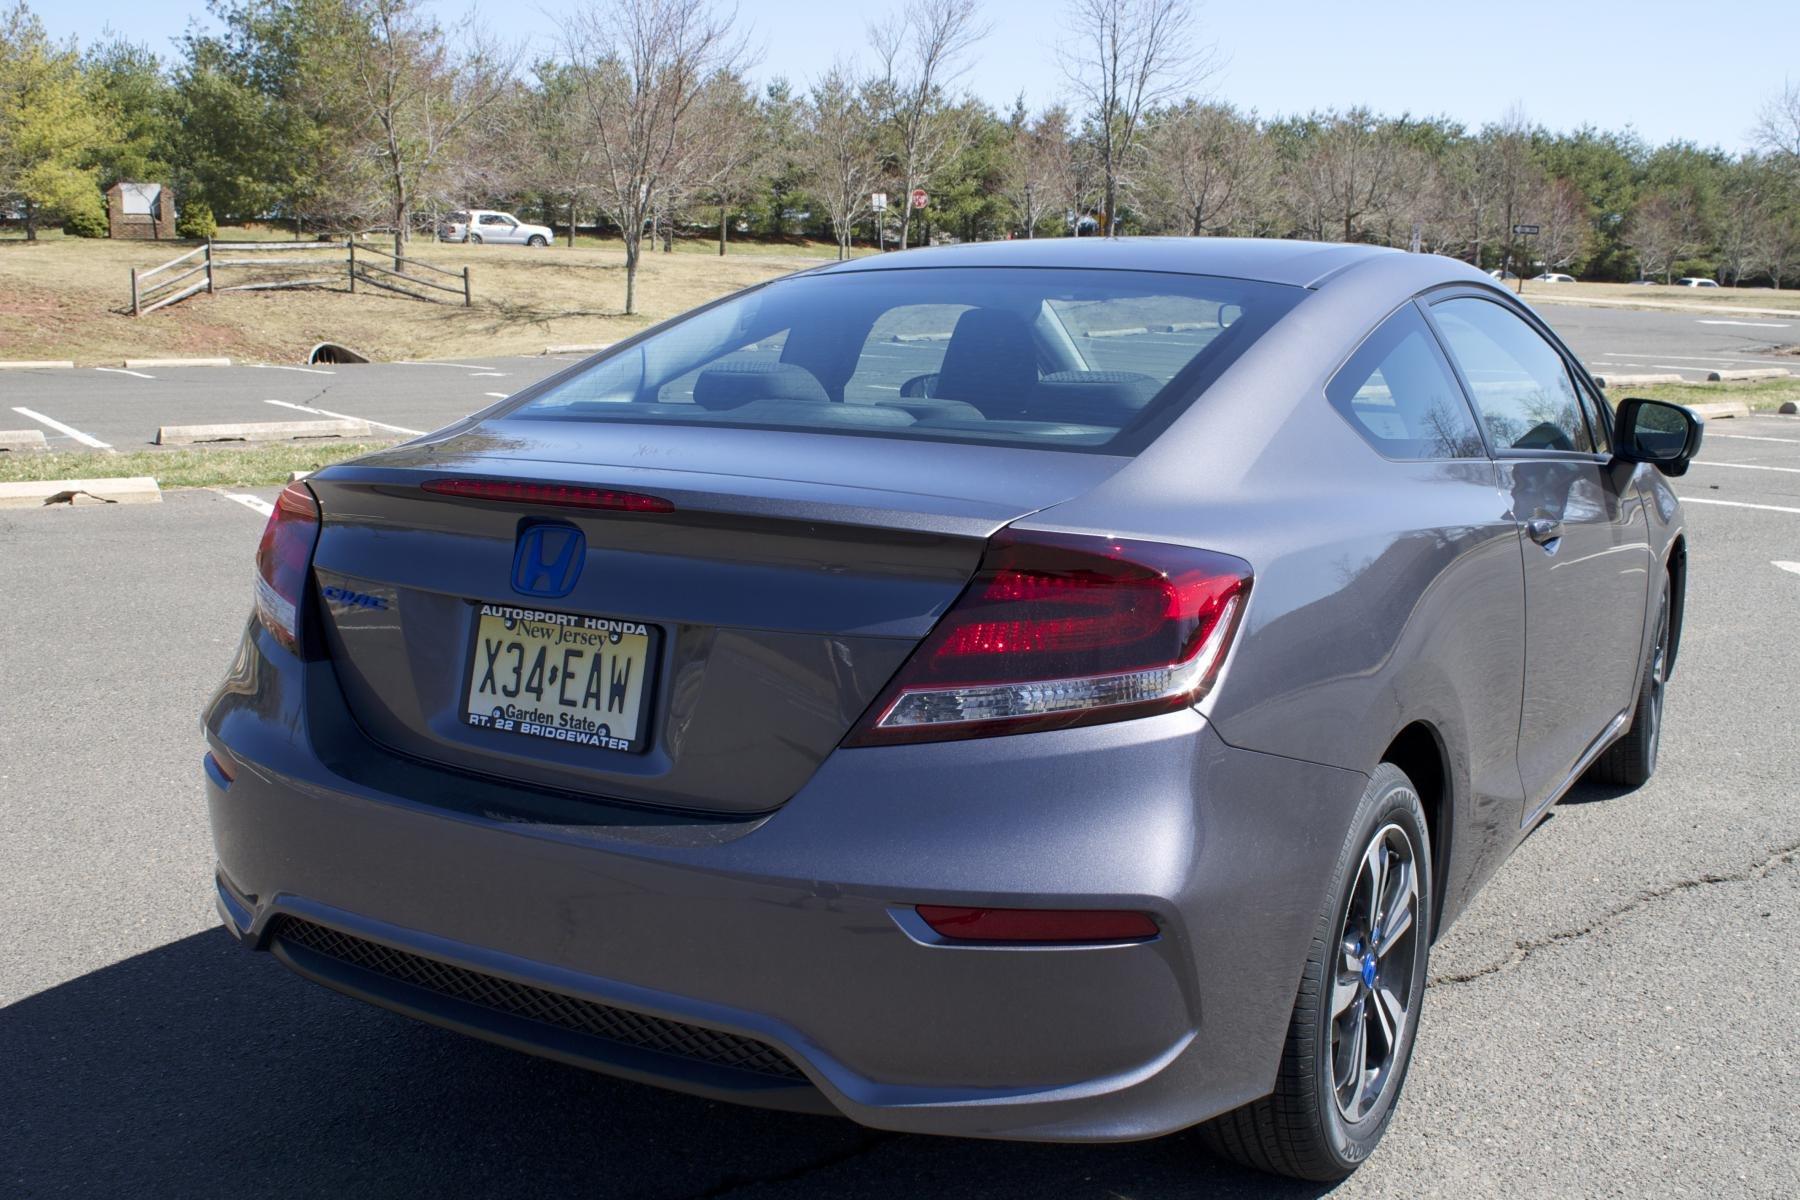 new 2014 honda civic ex coupe owner img_6049 jpg